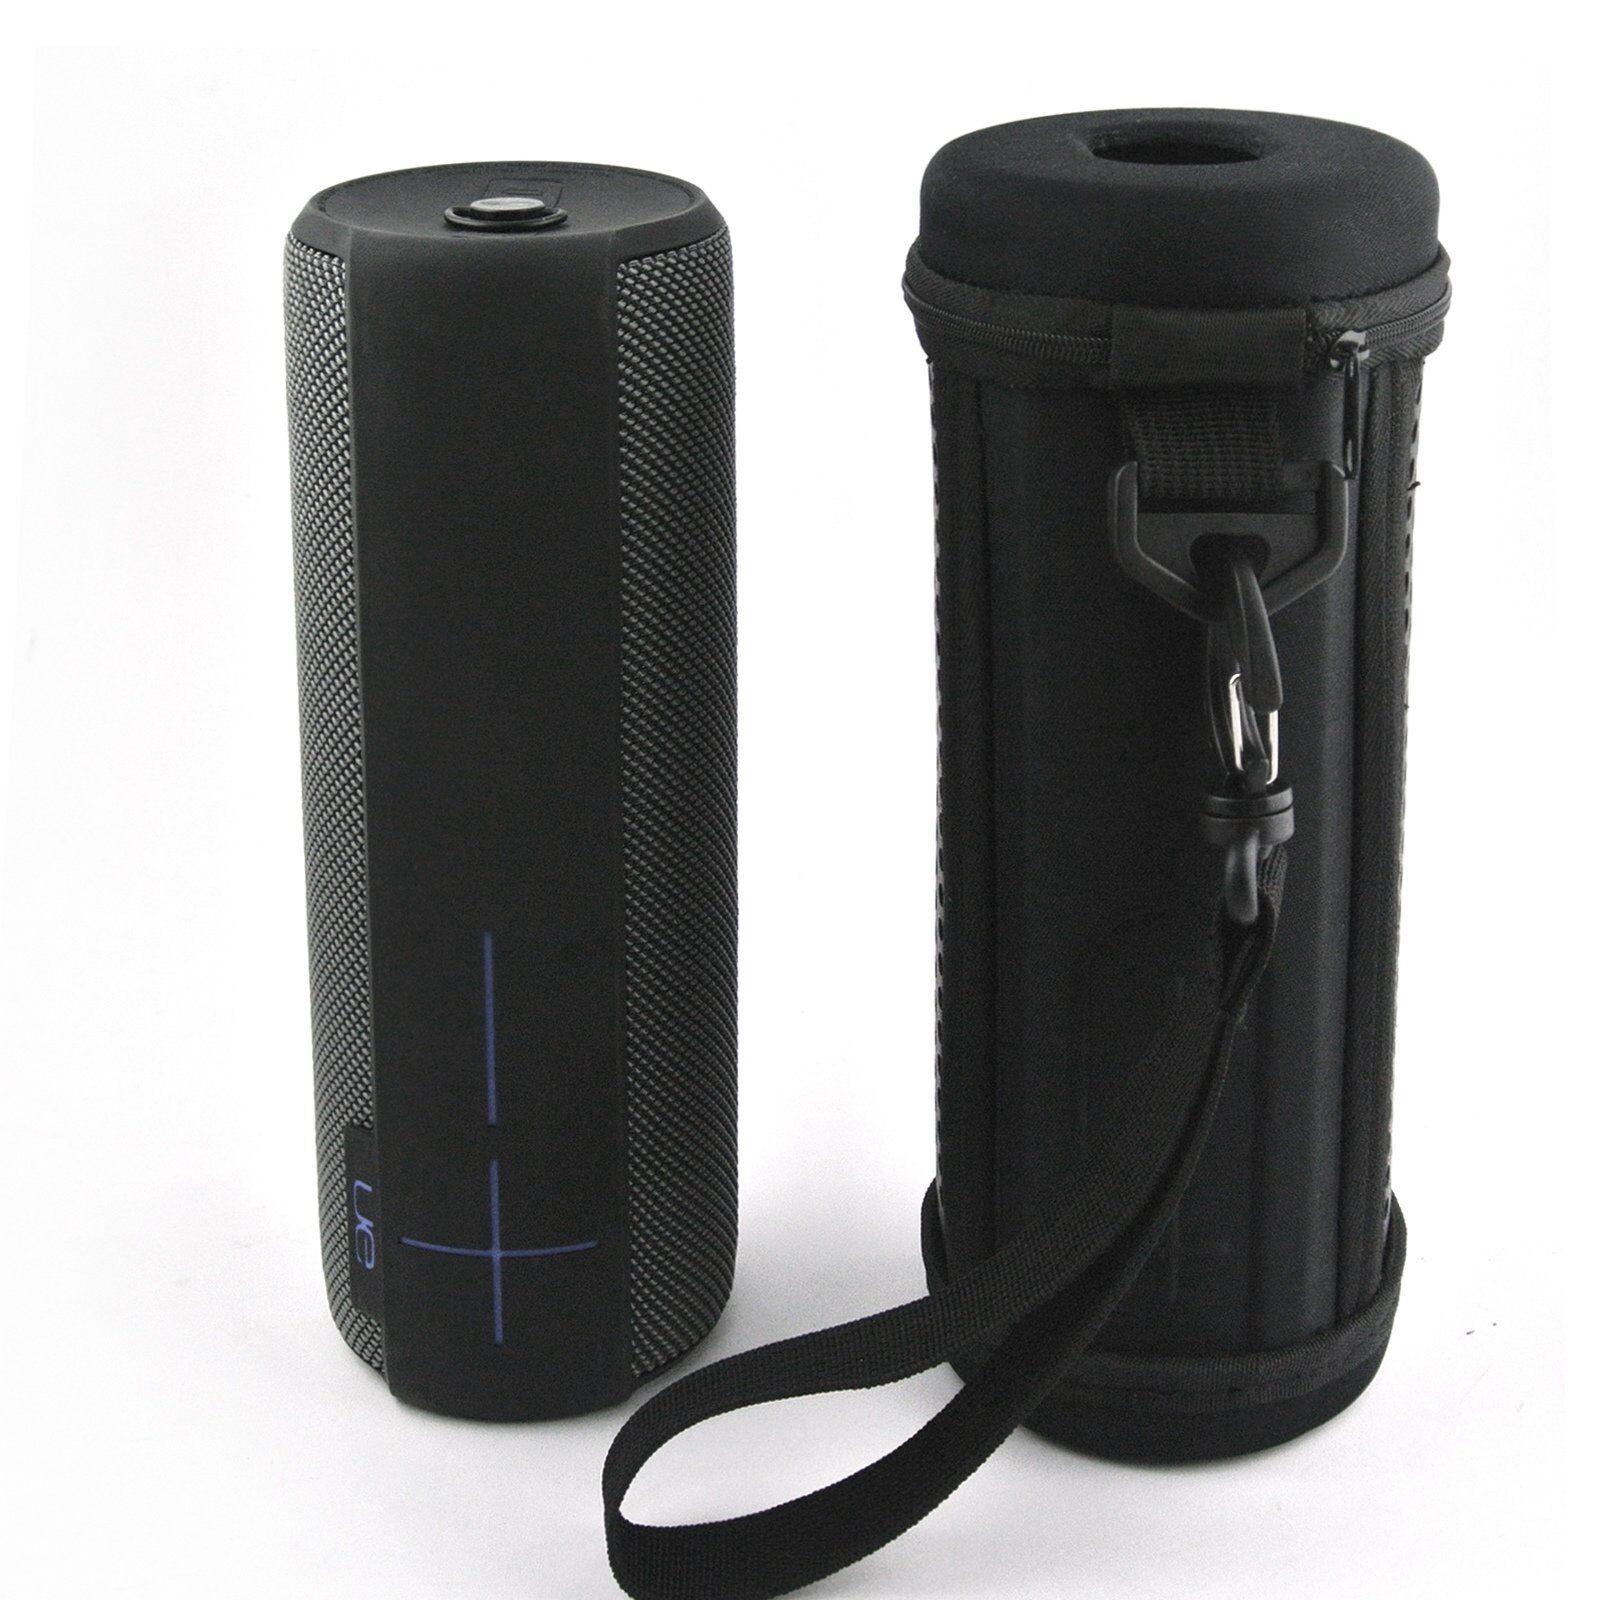 New For Logitech Ultimate Ears UE Megaboom 360º Speaker Travel Carry Case  Bag